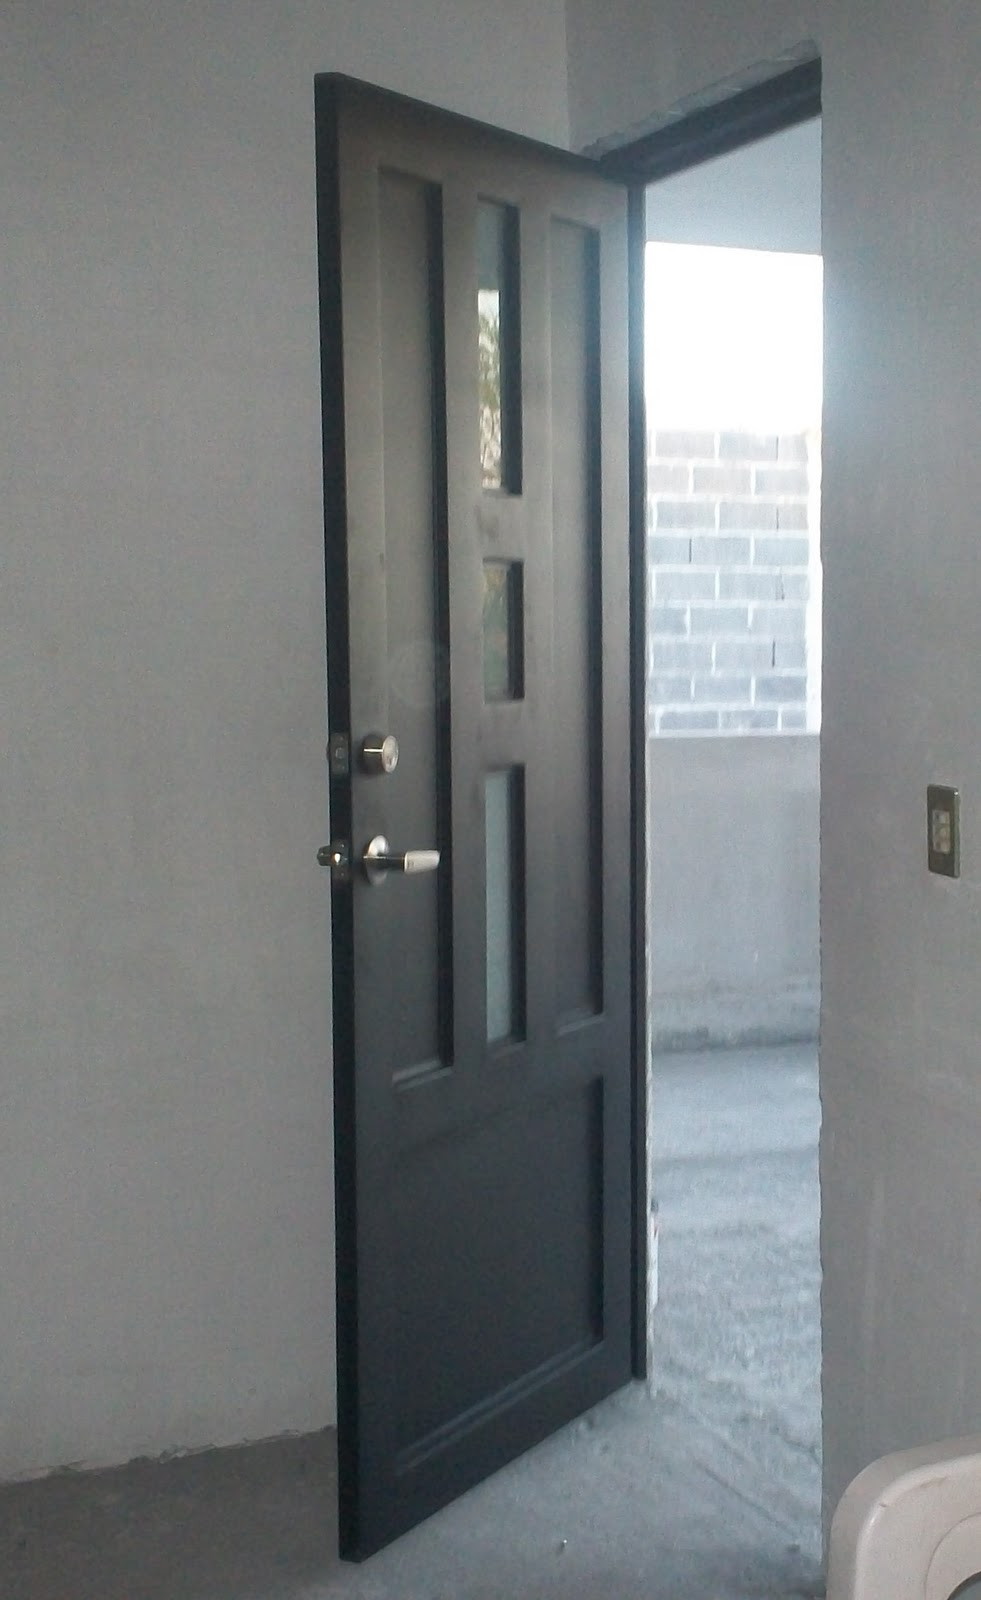 Puertas de hierro modernas simple puerta de entrada for Modelos de puertas de fierro modernas